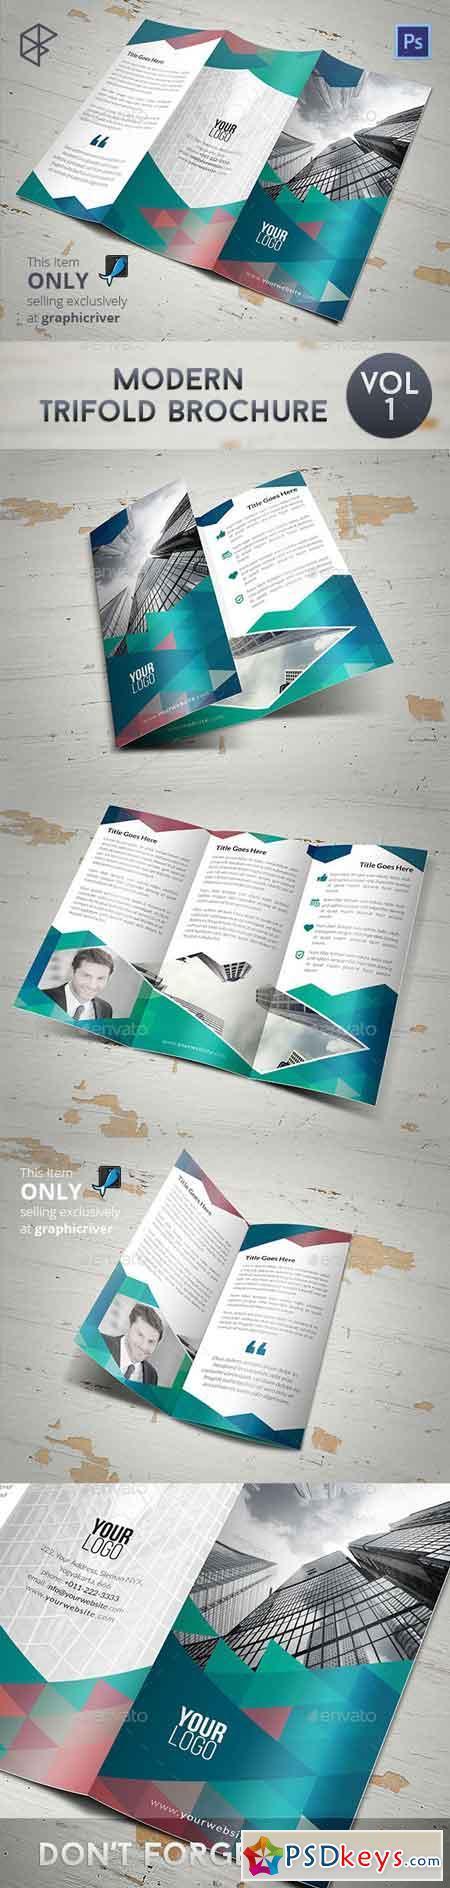 Modern Trifold Brochure 7893680